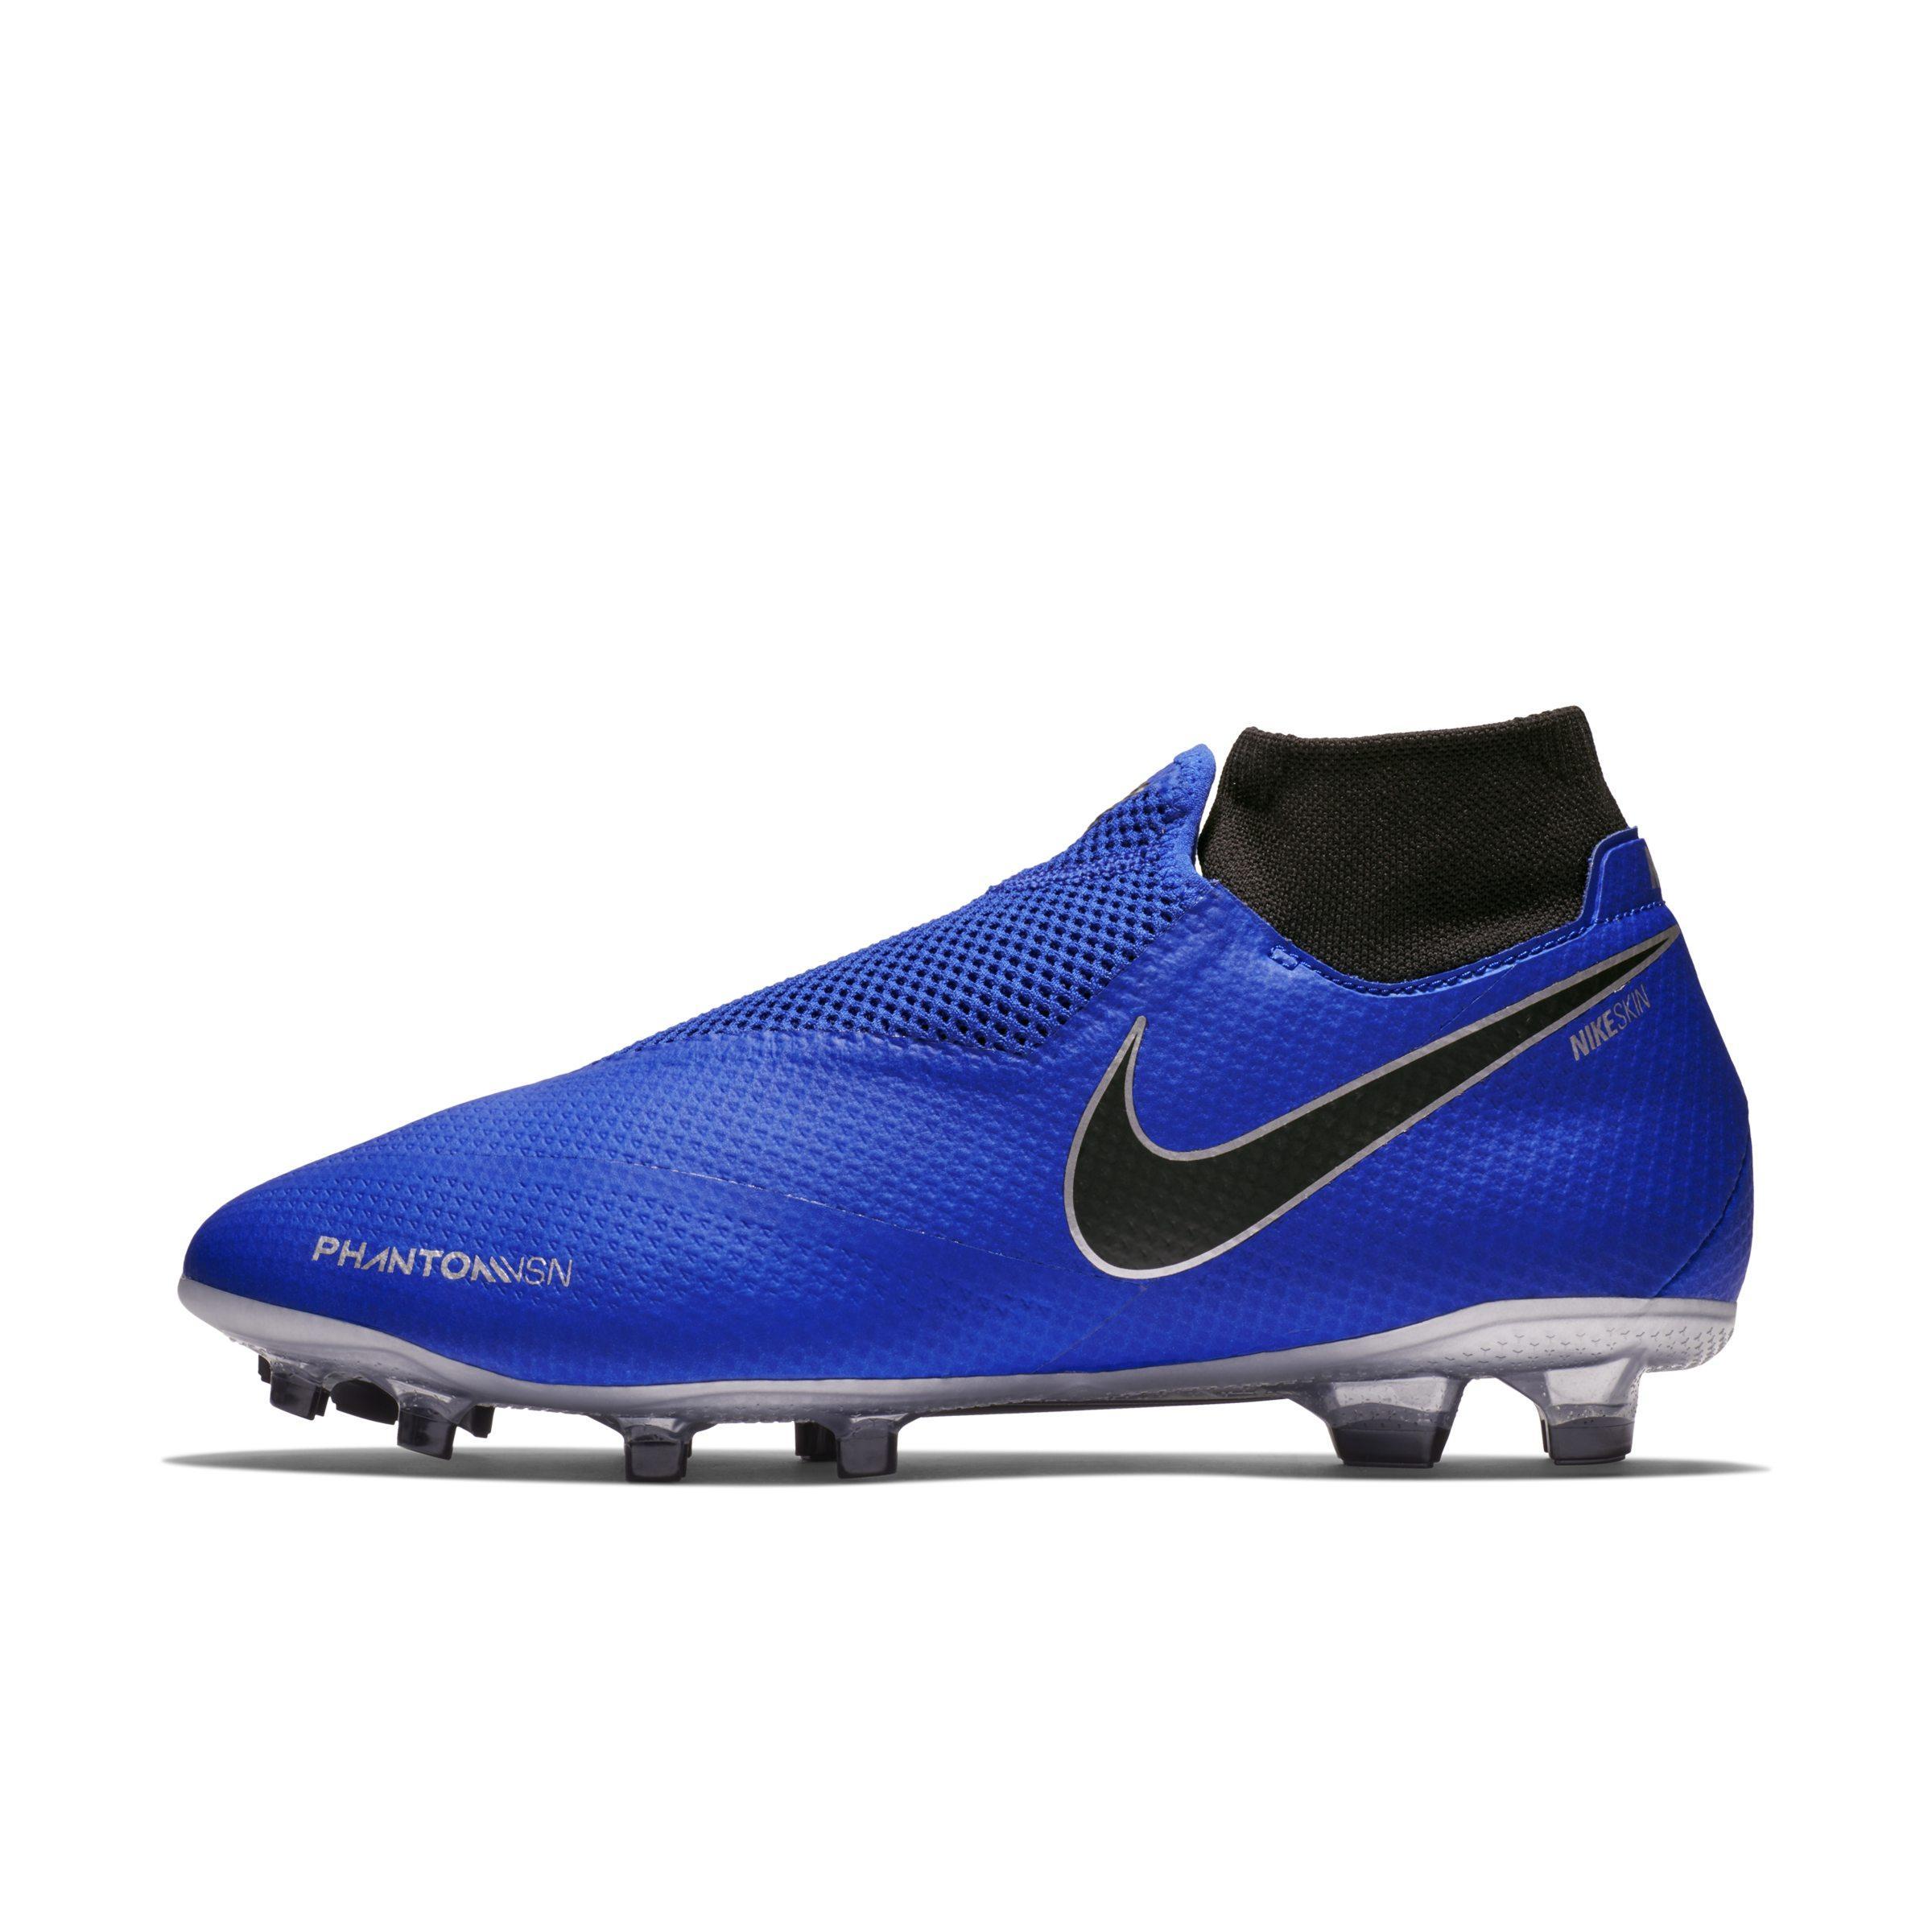 0d4af92faa7b Nike. Women's Blue Phantomvsn Pro Dynamic Fit Fg Firm-ground Football Boot